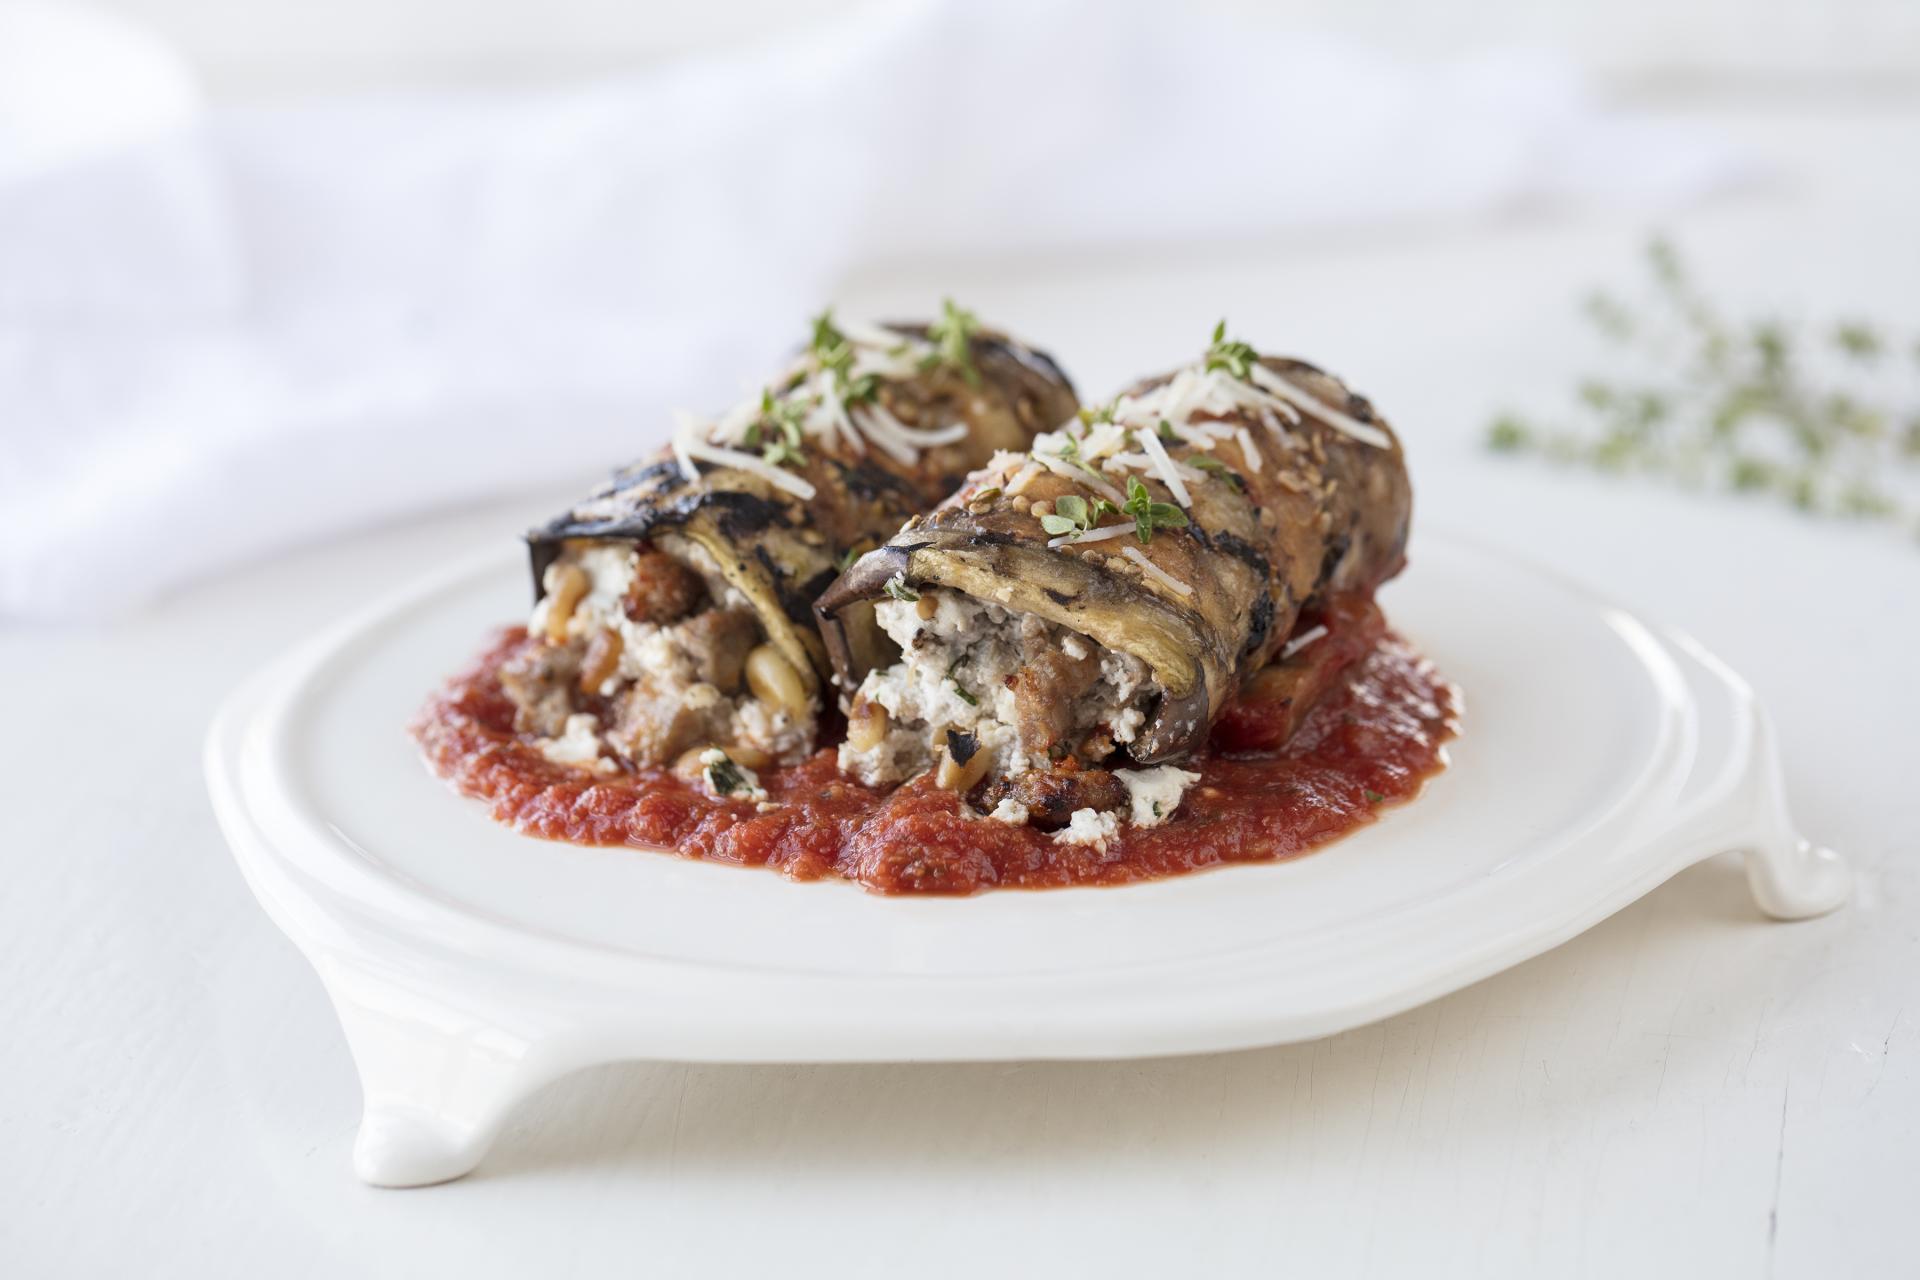 Eggplant Rollatini with Herbs de Humboldt®